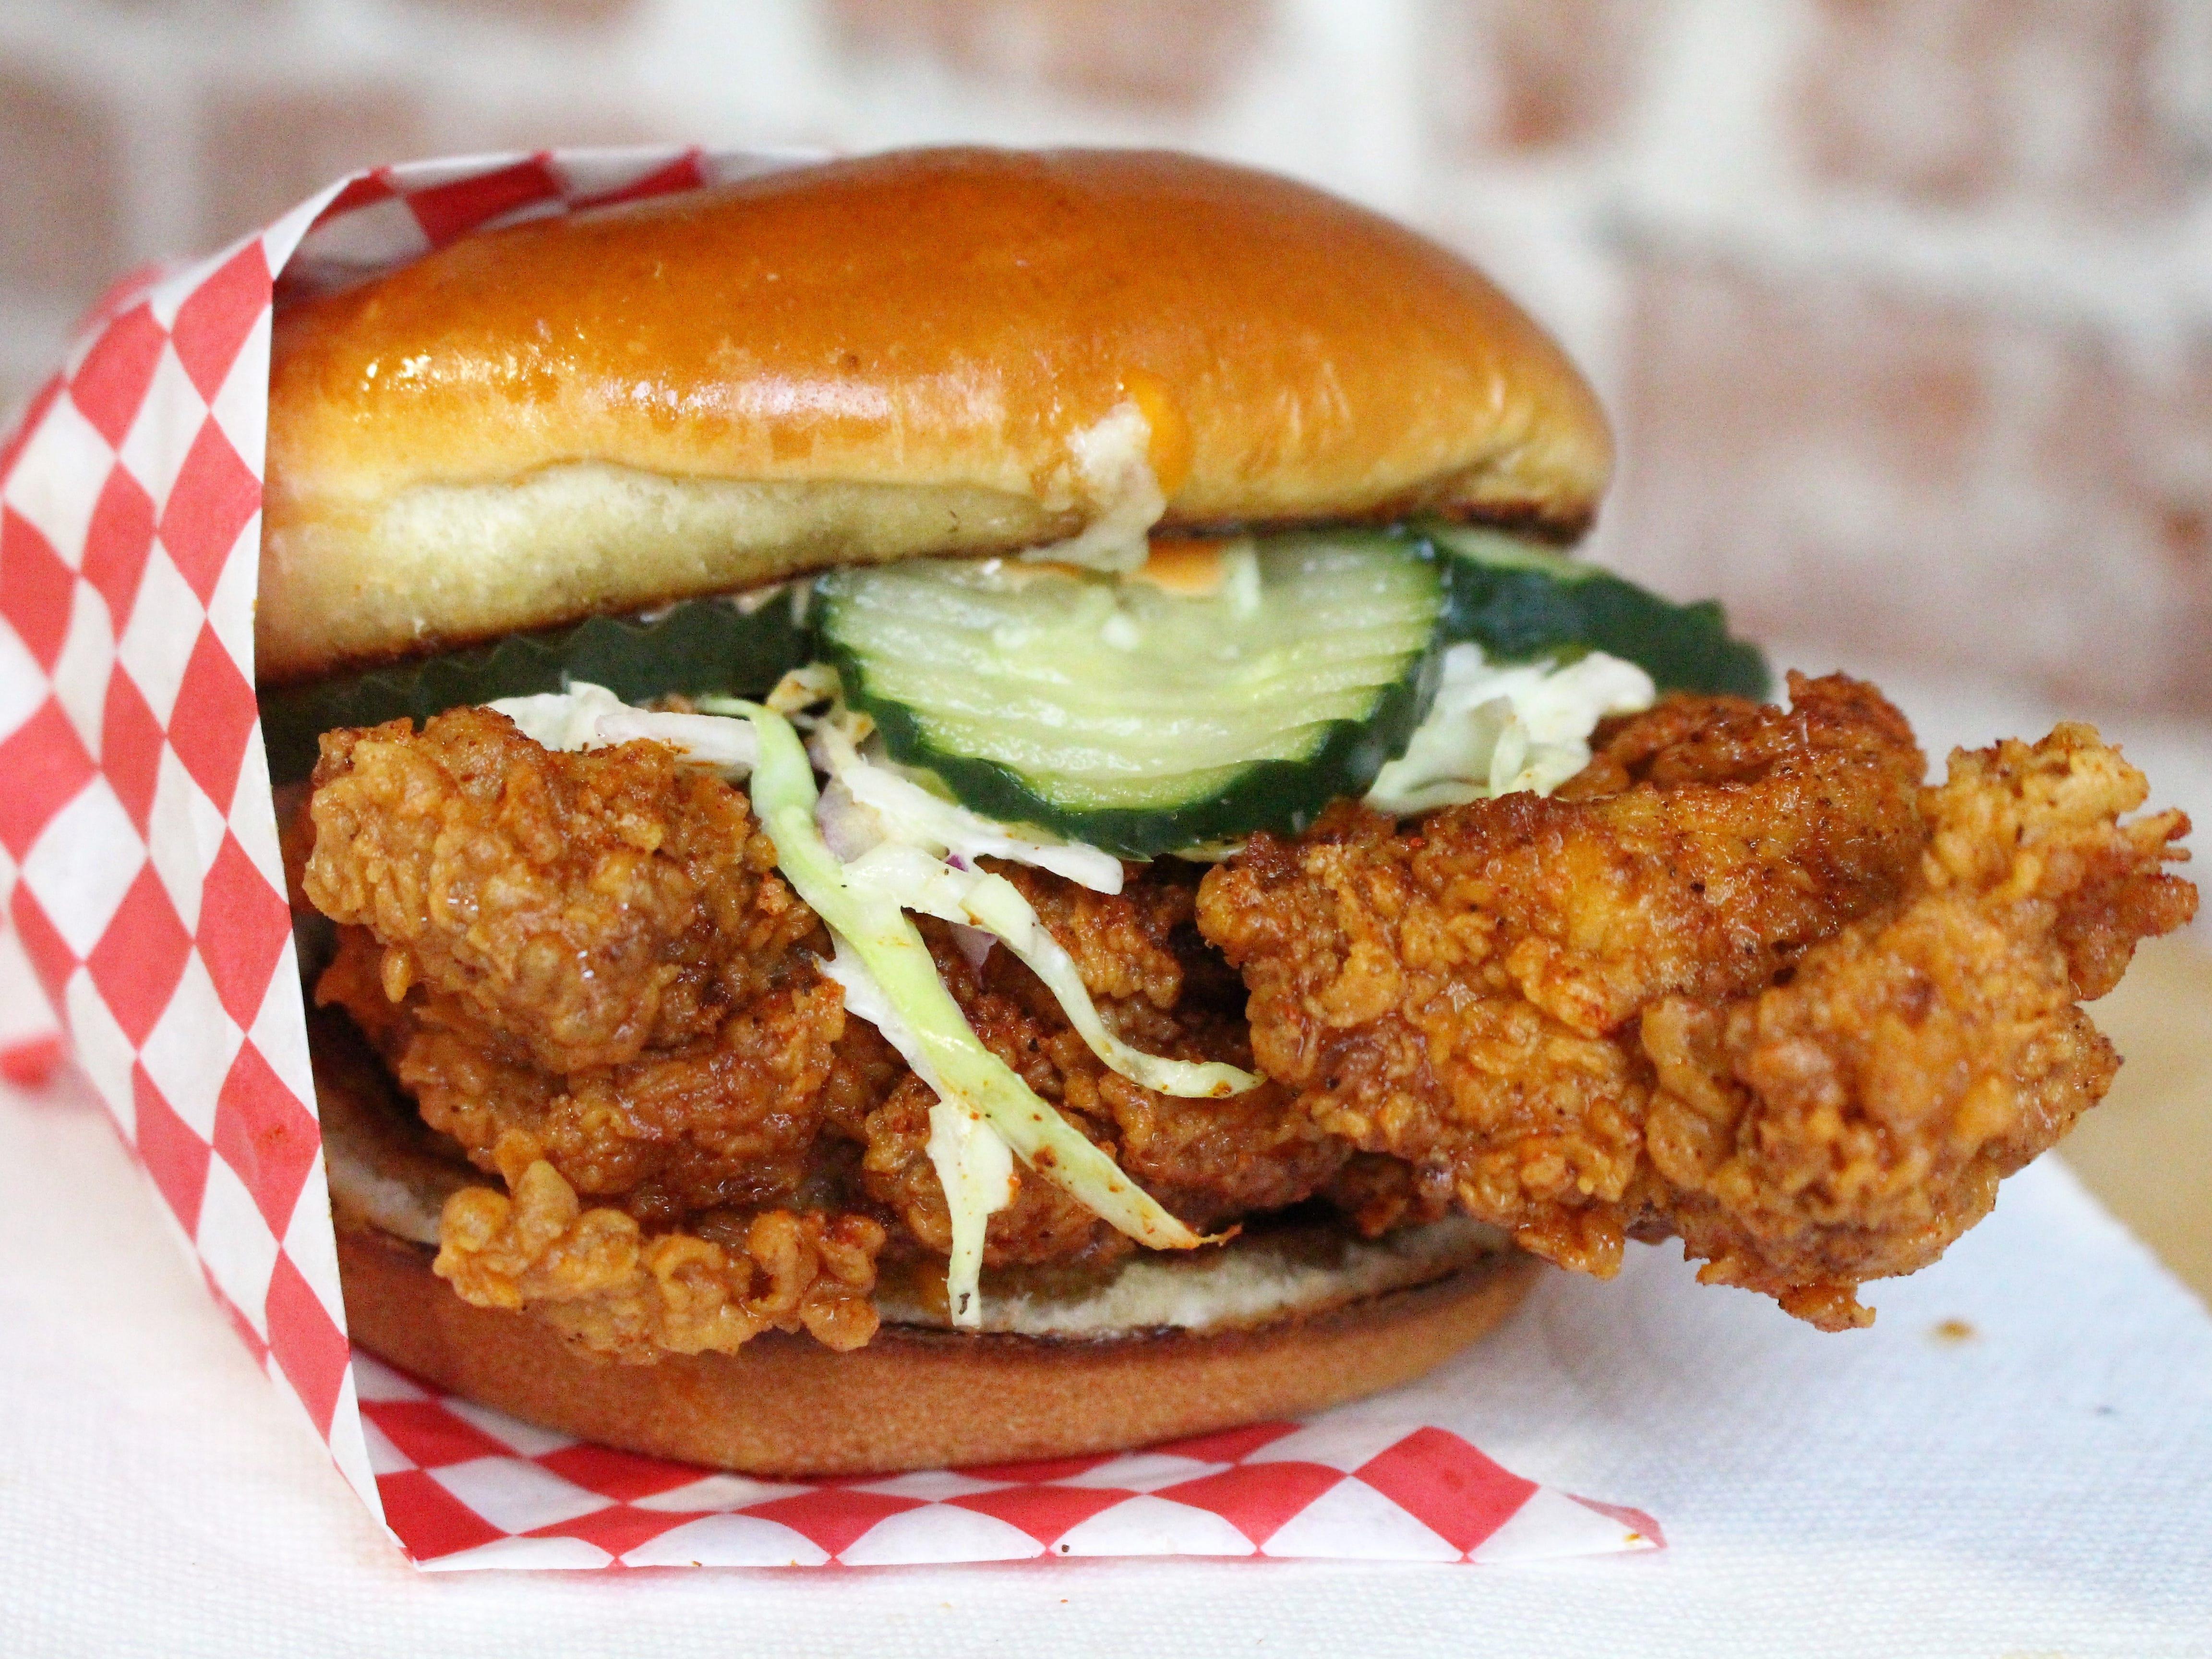 The fried chicken sandwich at Monroe's Hot Chicken in downtown Phoenix.